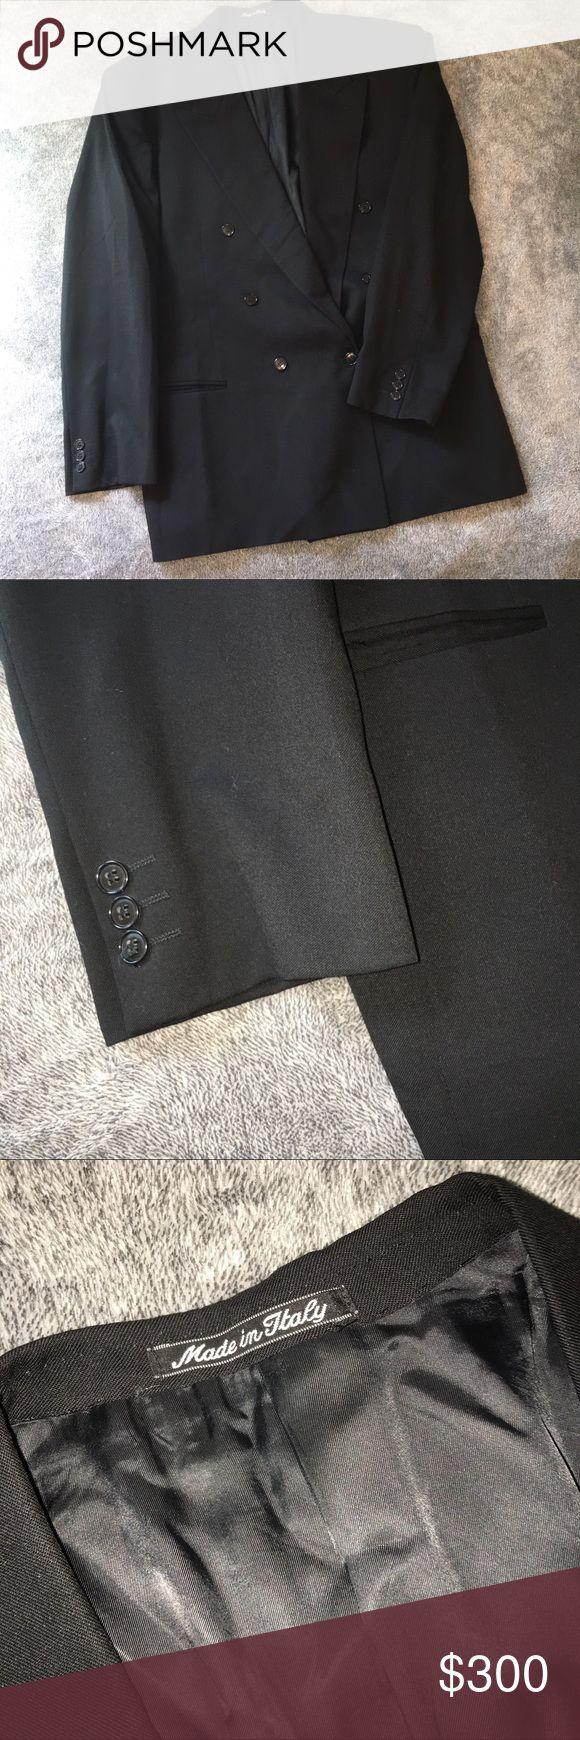 Mani by Giorgio Armani Suit Jacket Mani by Giorgio Armani Suit Jacket Giorgio Armani Suits & Blazers